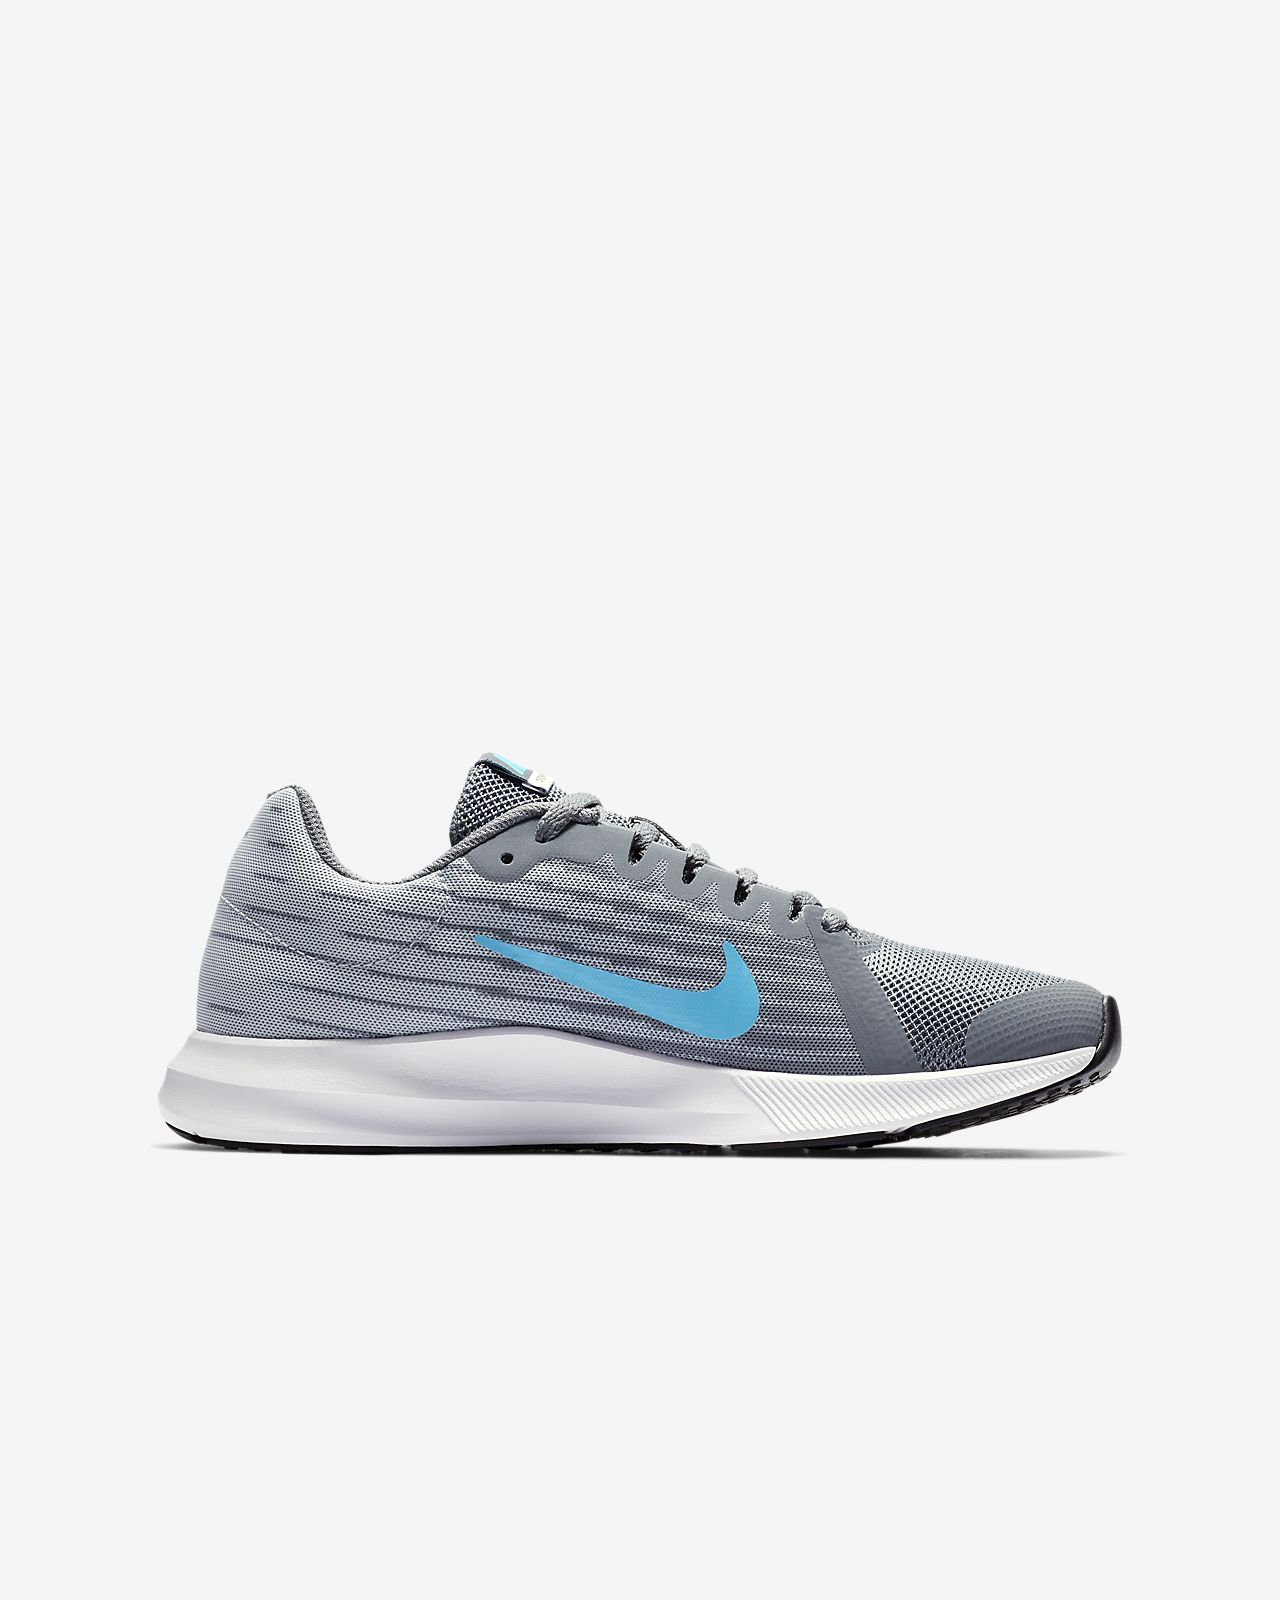 Calzado de running para niños talla grande Nike Downshifter 8. Nike ... 04784fc504545